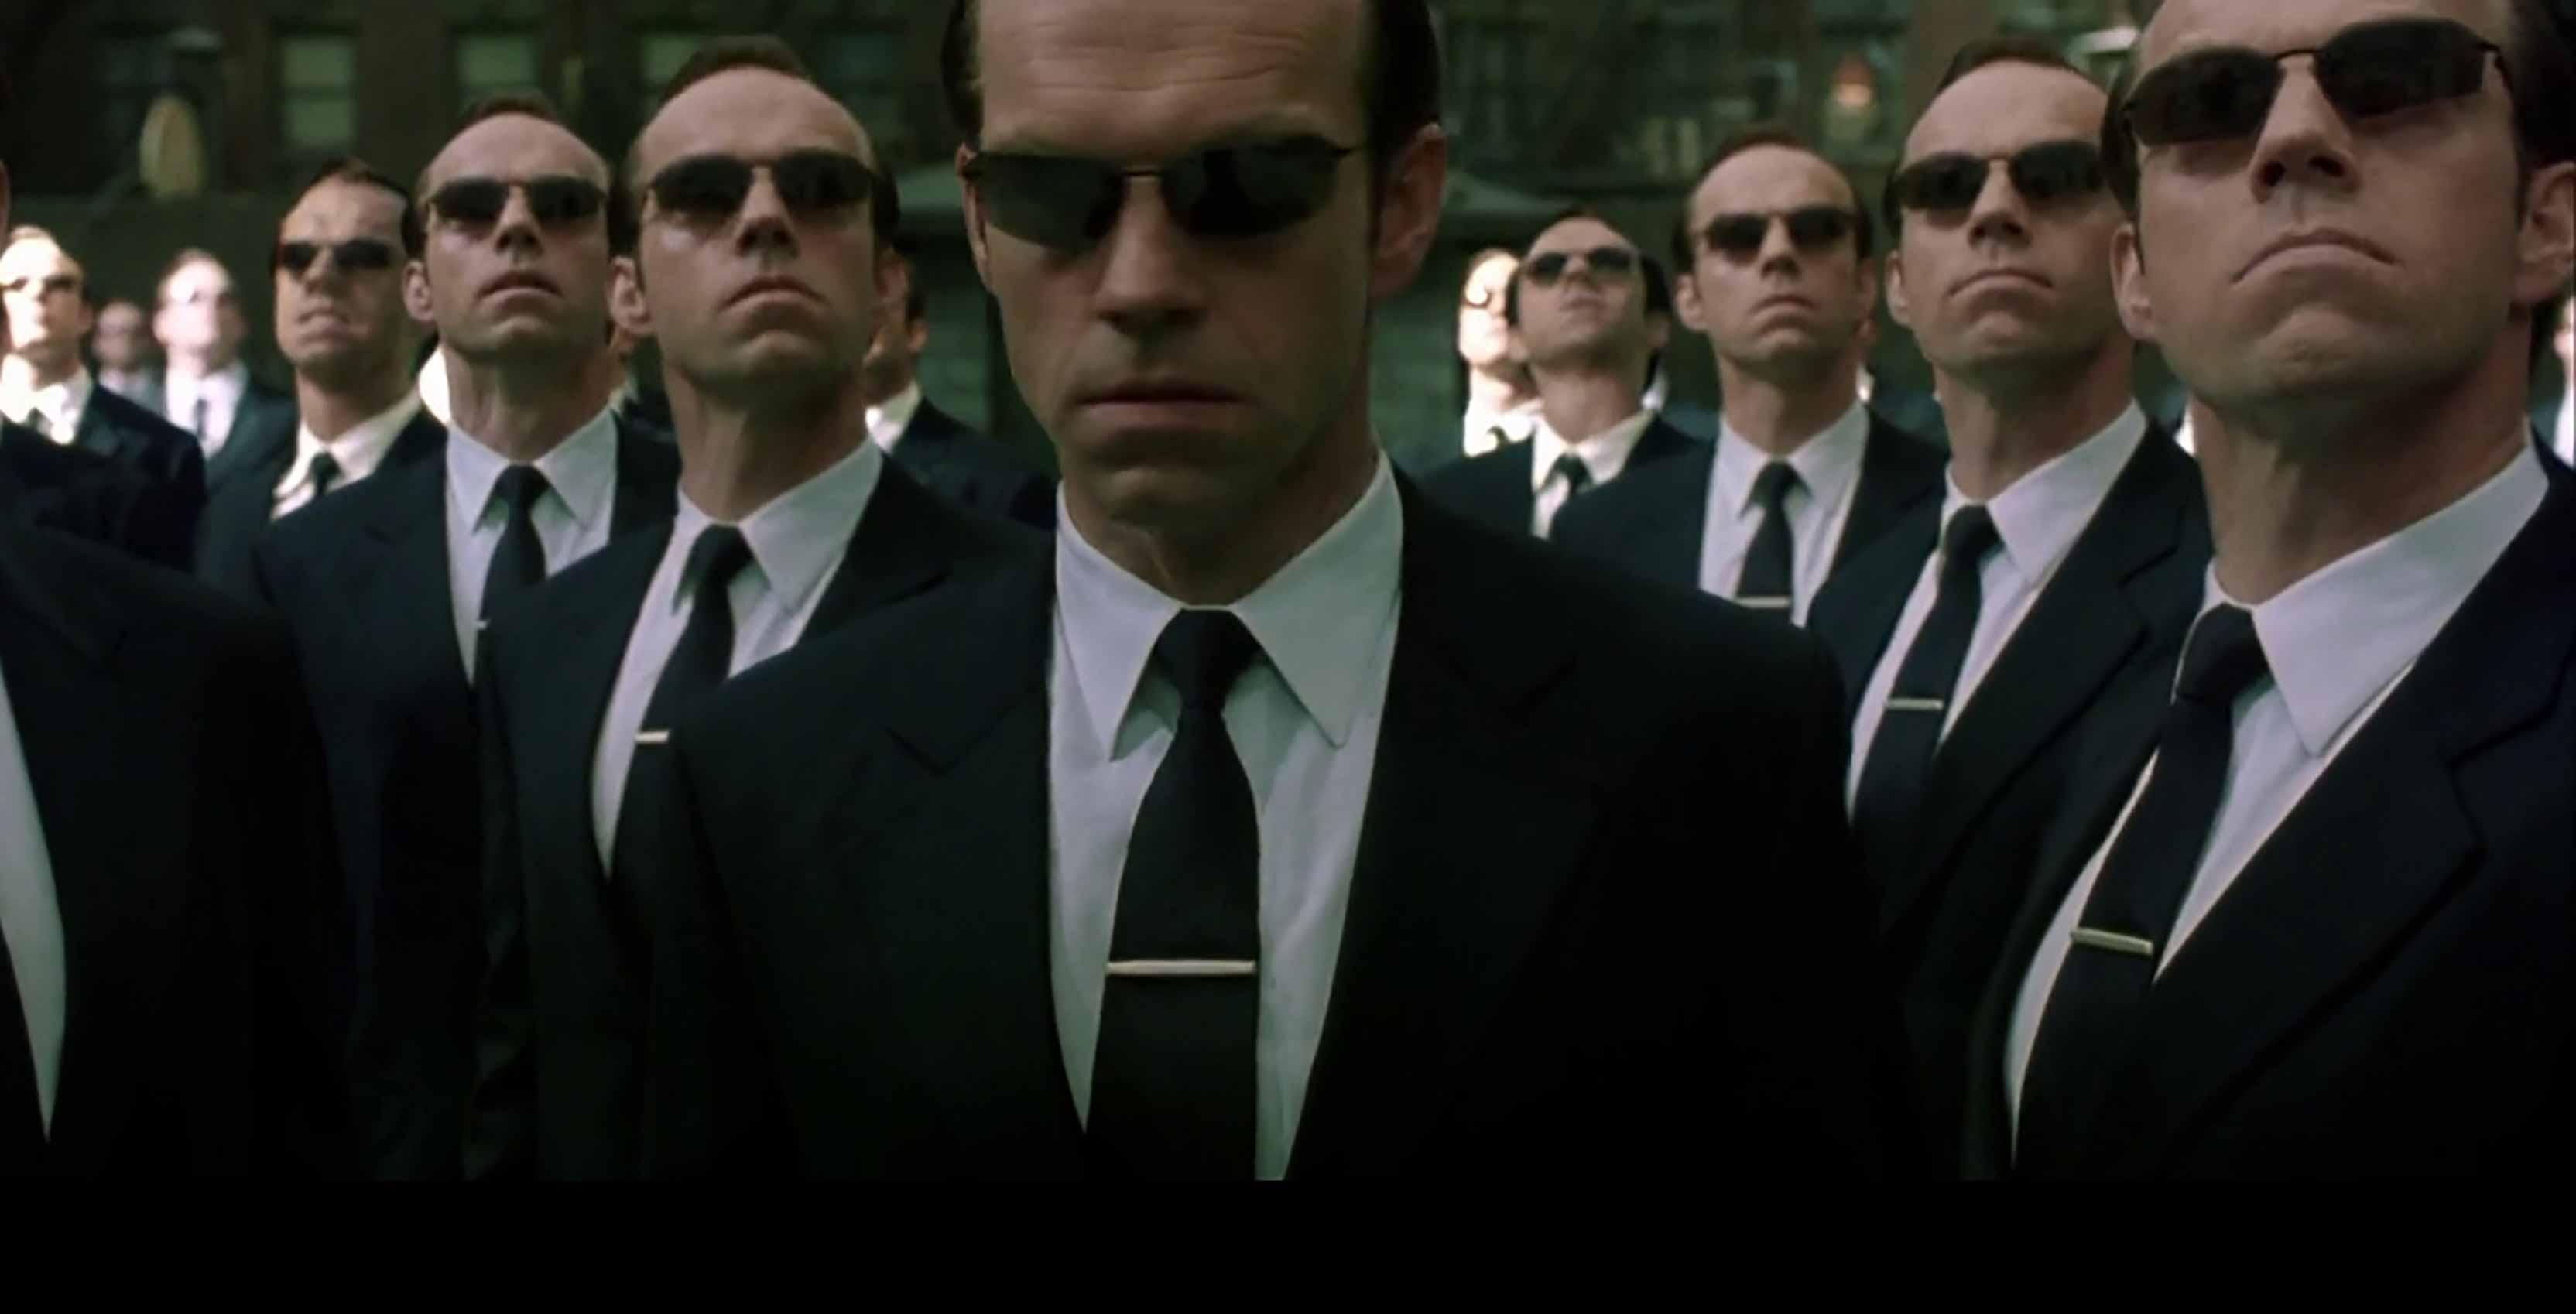 agents smith